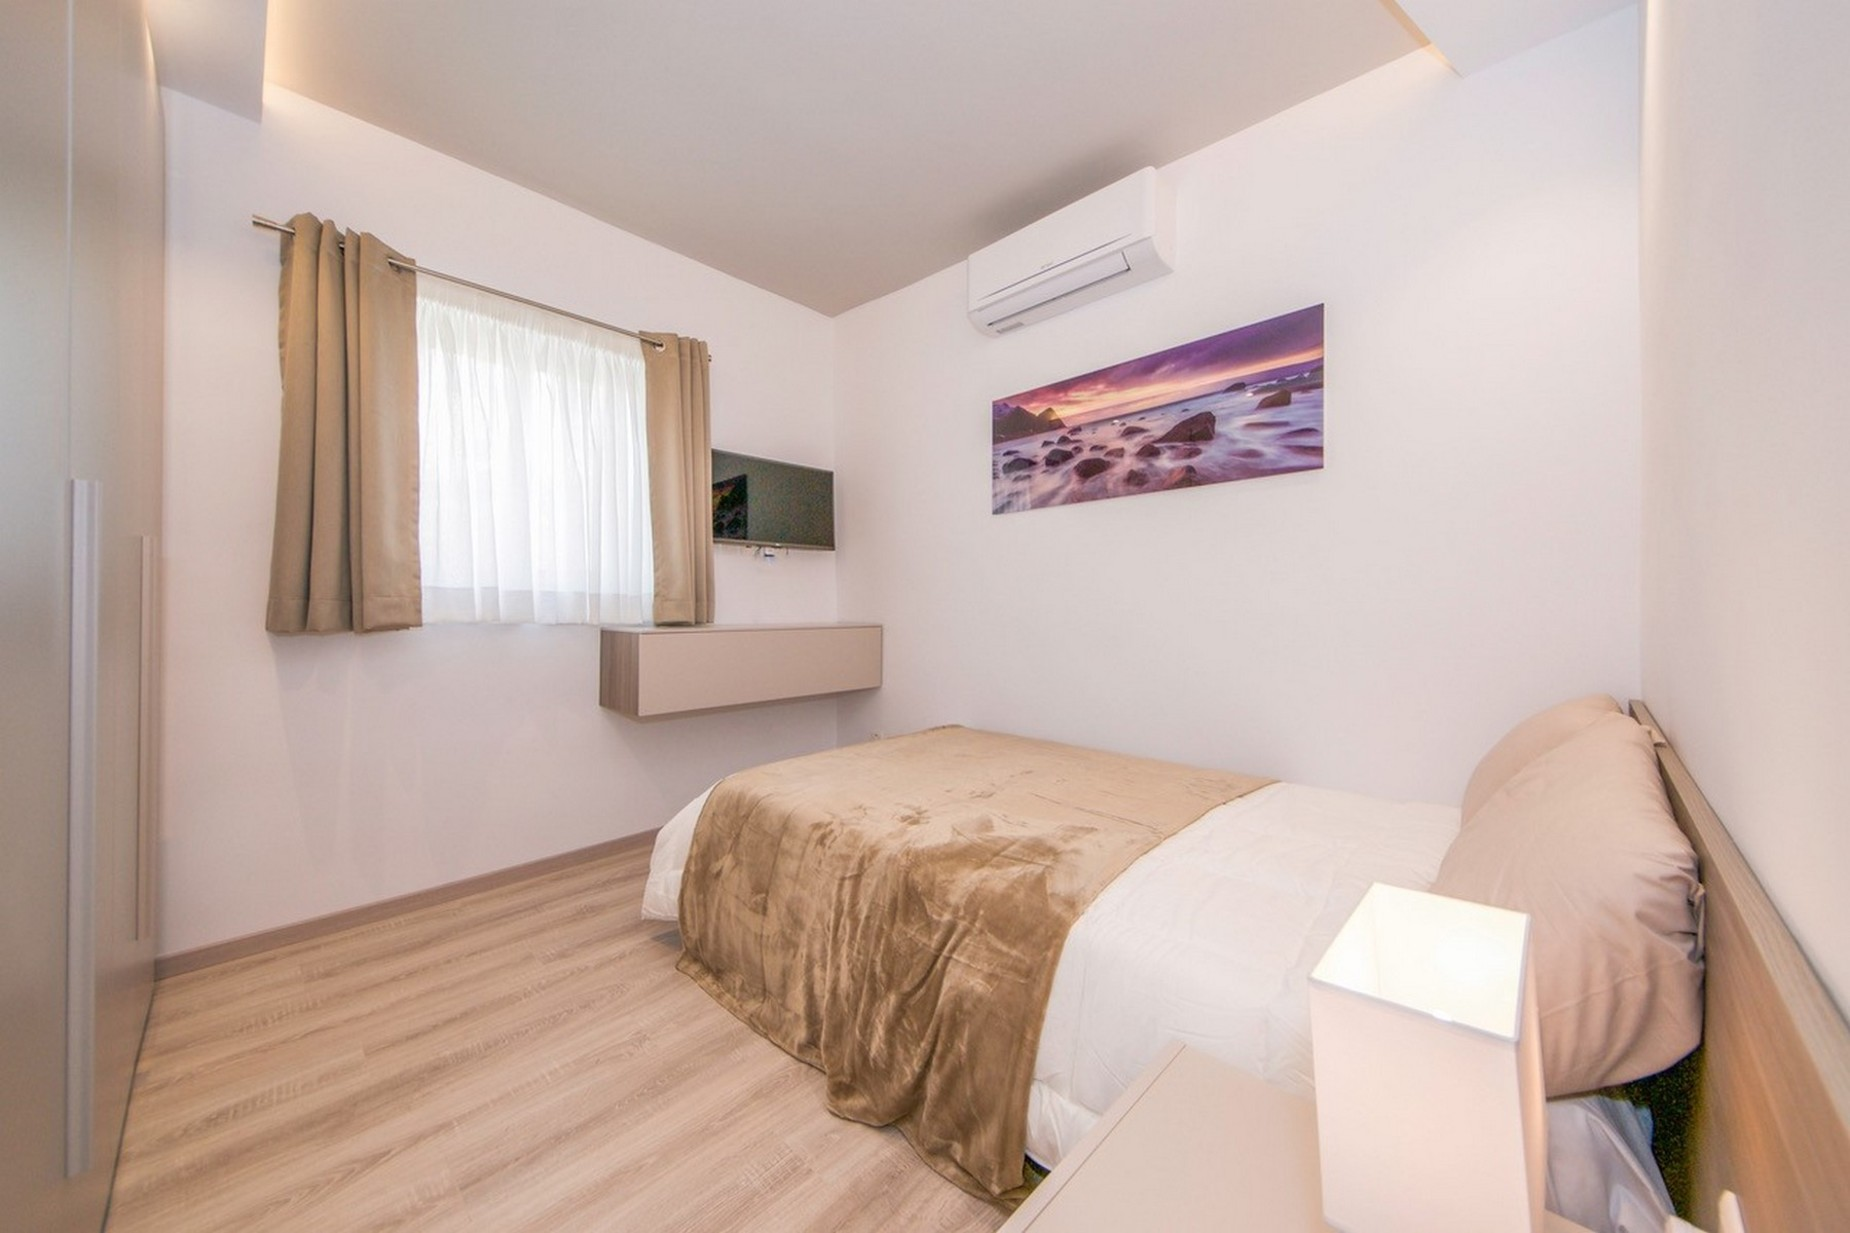 2 bed Apartment For Rent in Qawra, Qawra - thumb 13